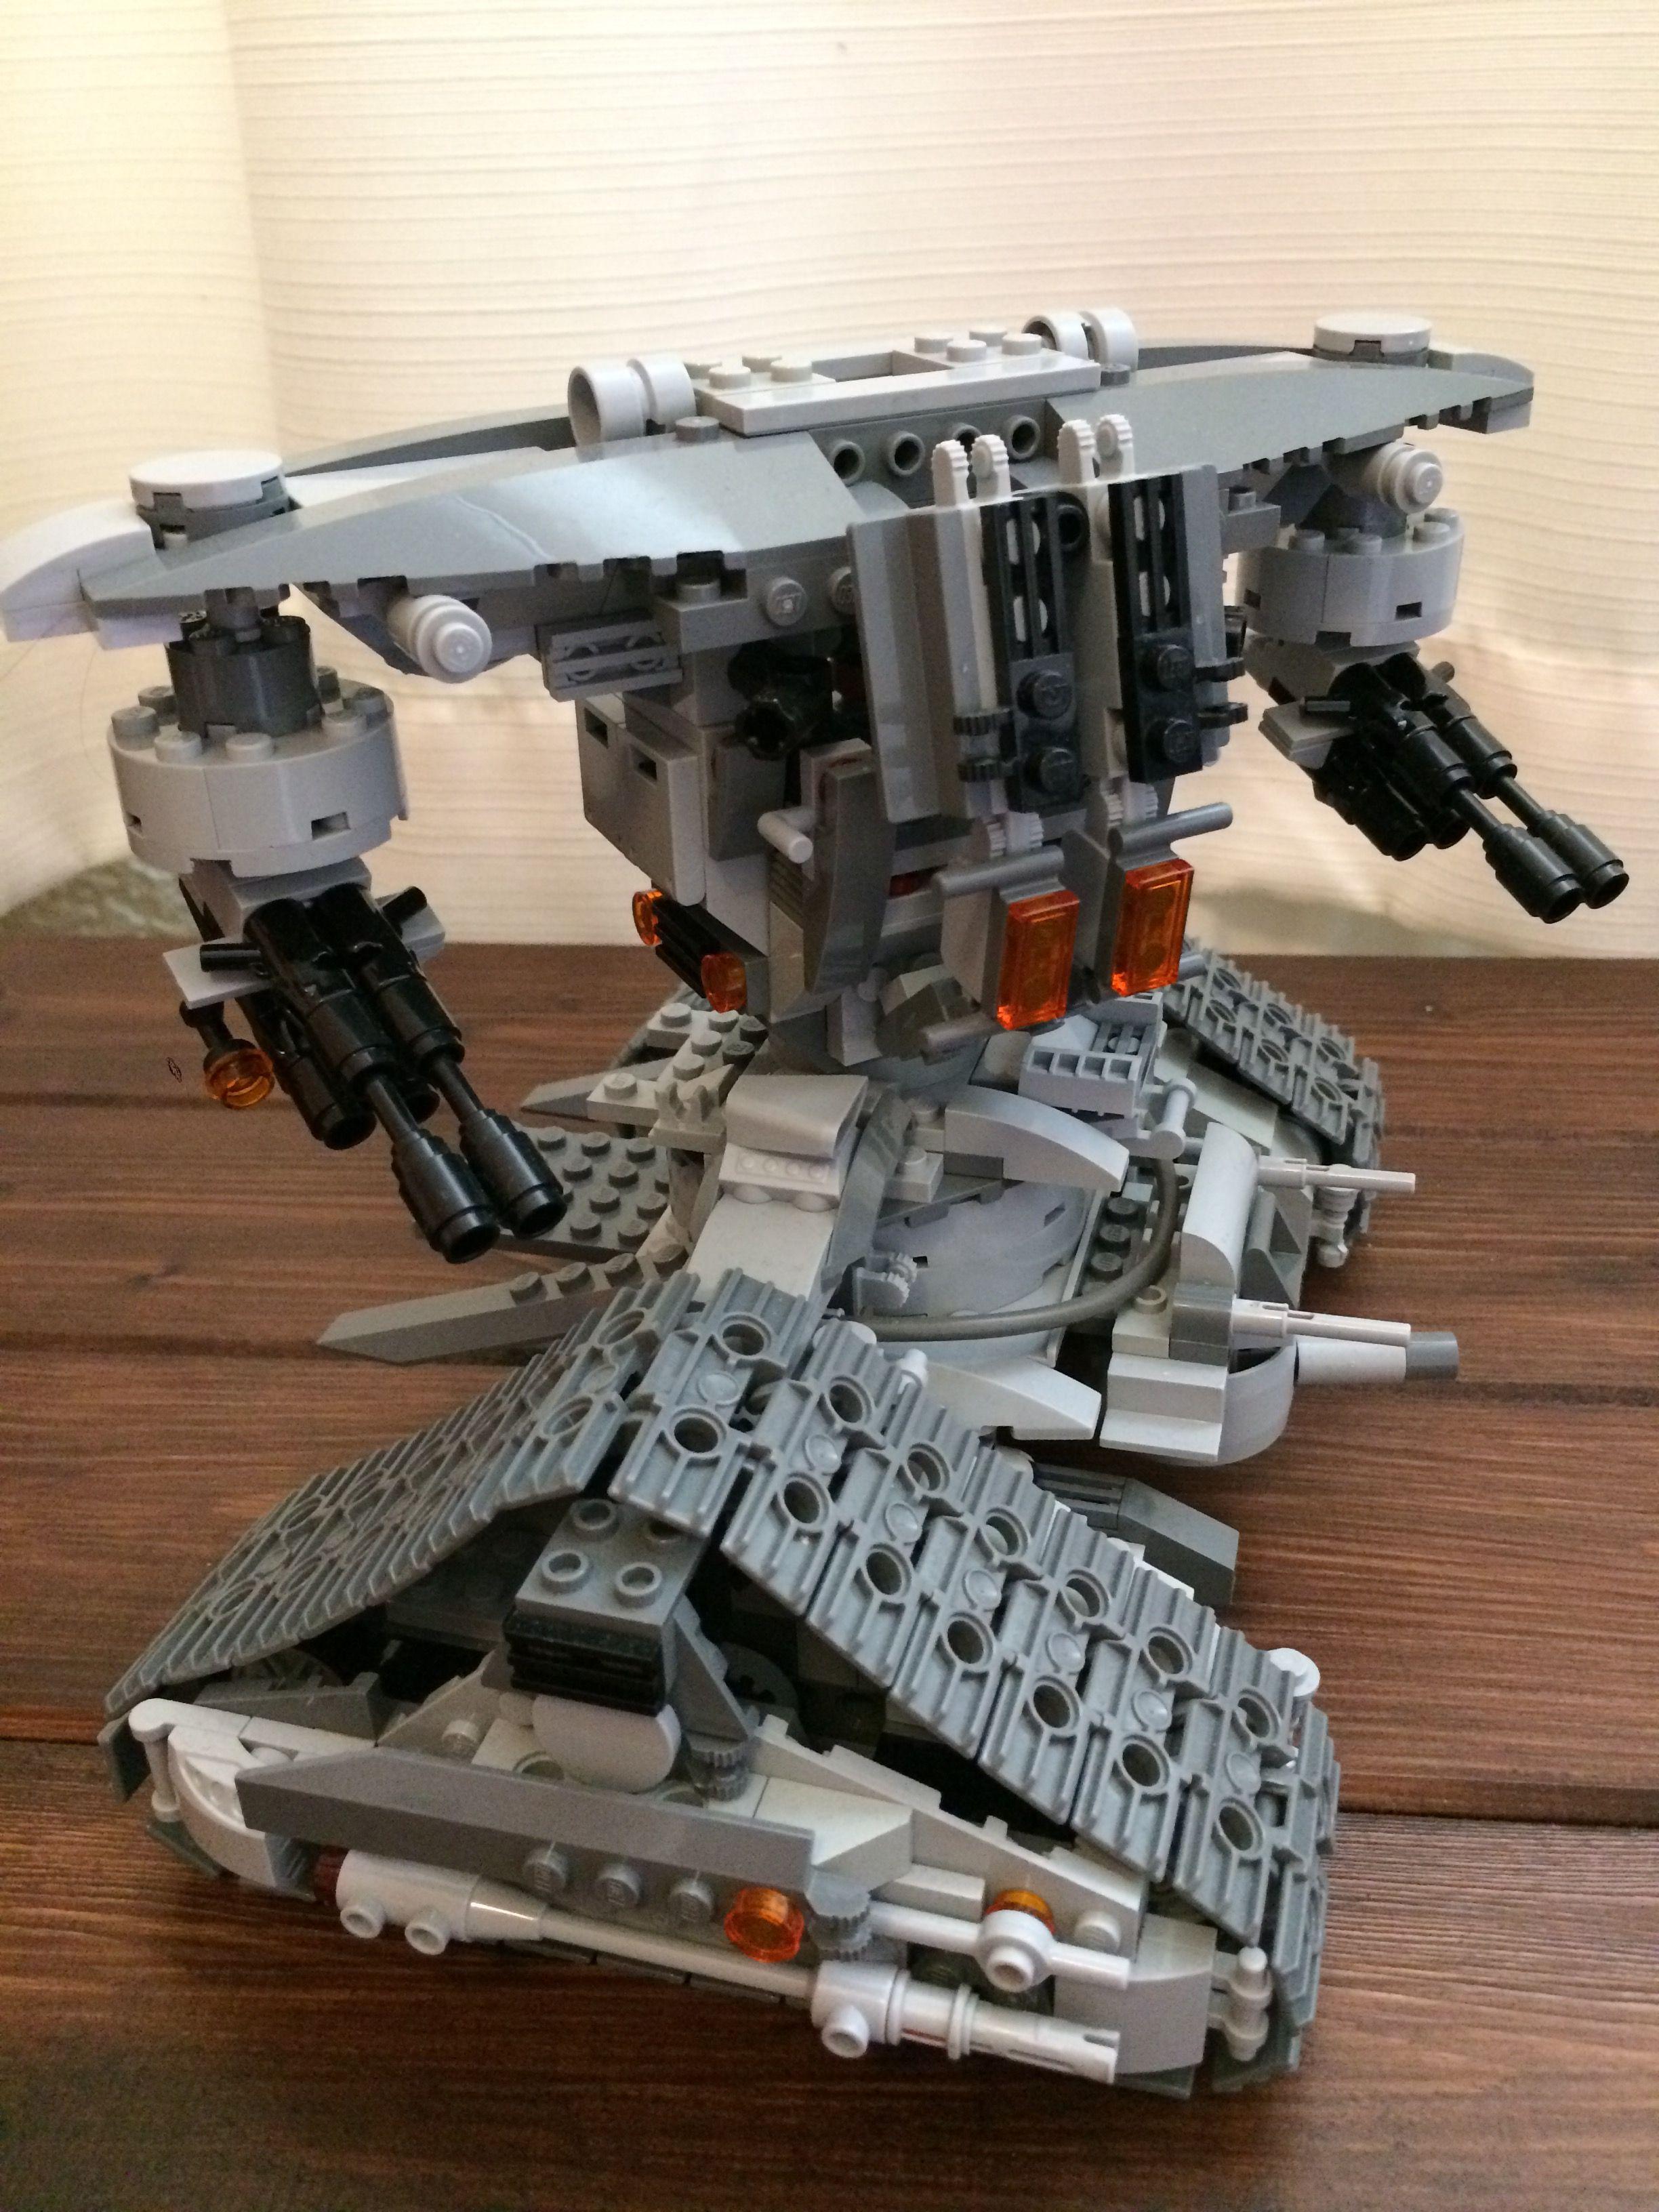 AngleUnfinished Moc Different Lego Ish Still Hk Tank From BerdCxo